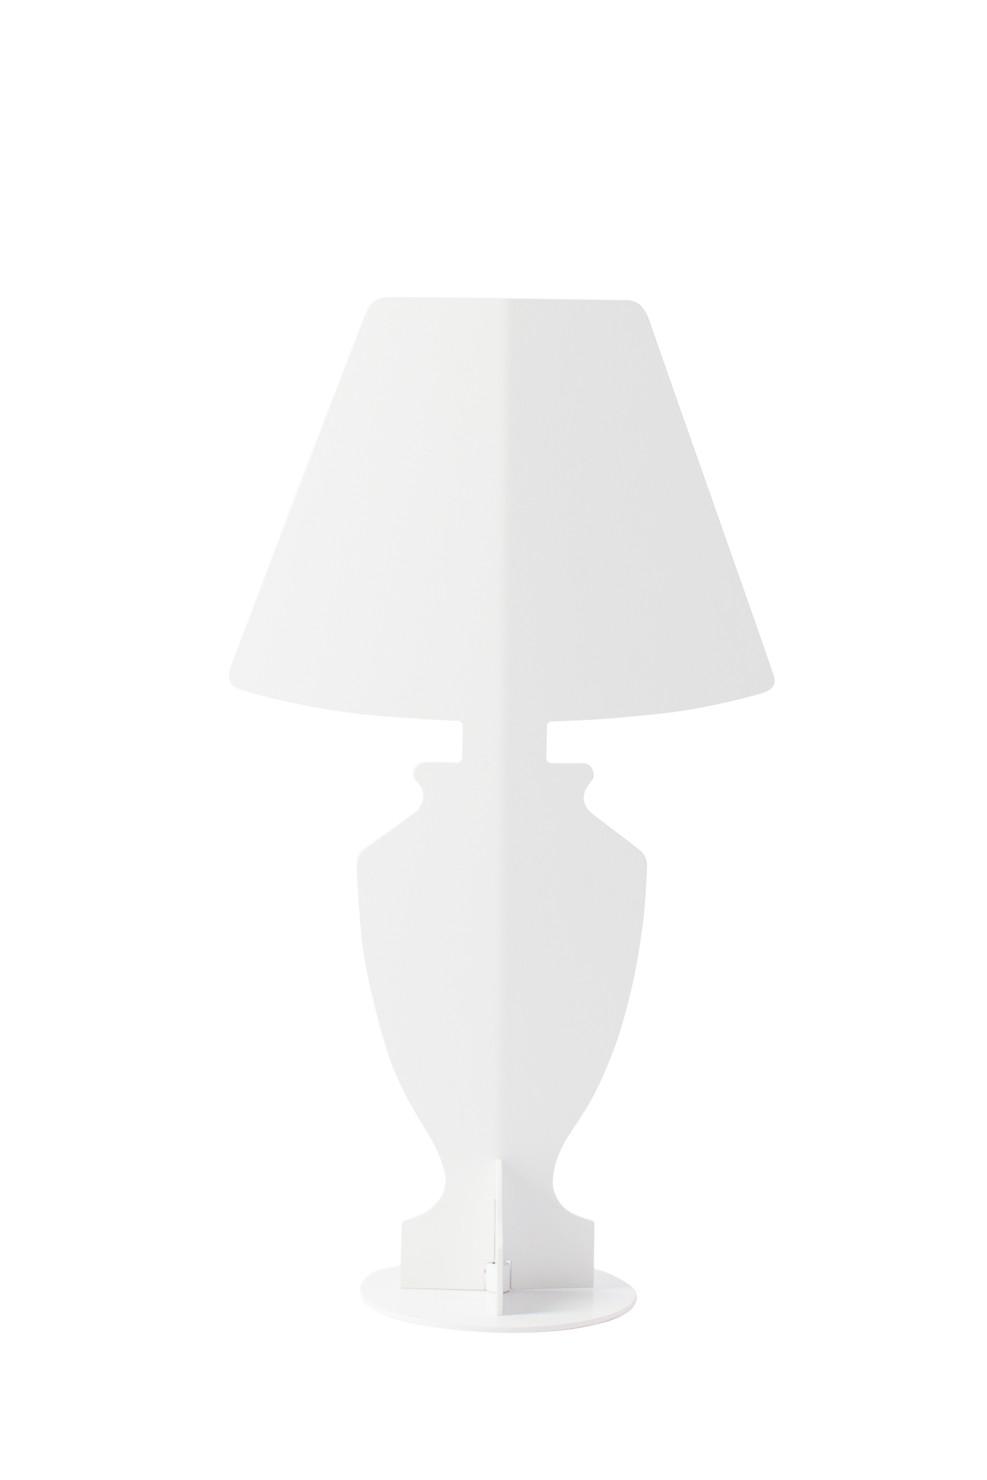 Lampada da tavolo ahua design mini classic bianca made in italy - Lampada da tavolo classica ...